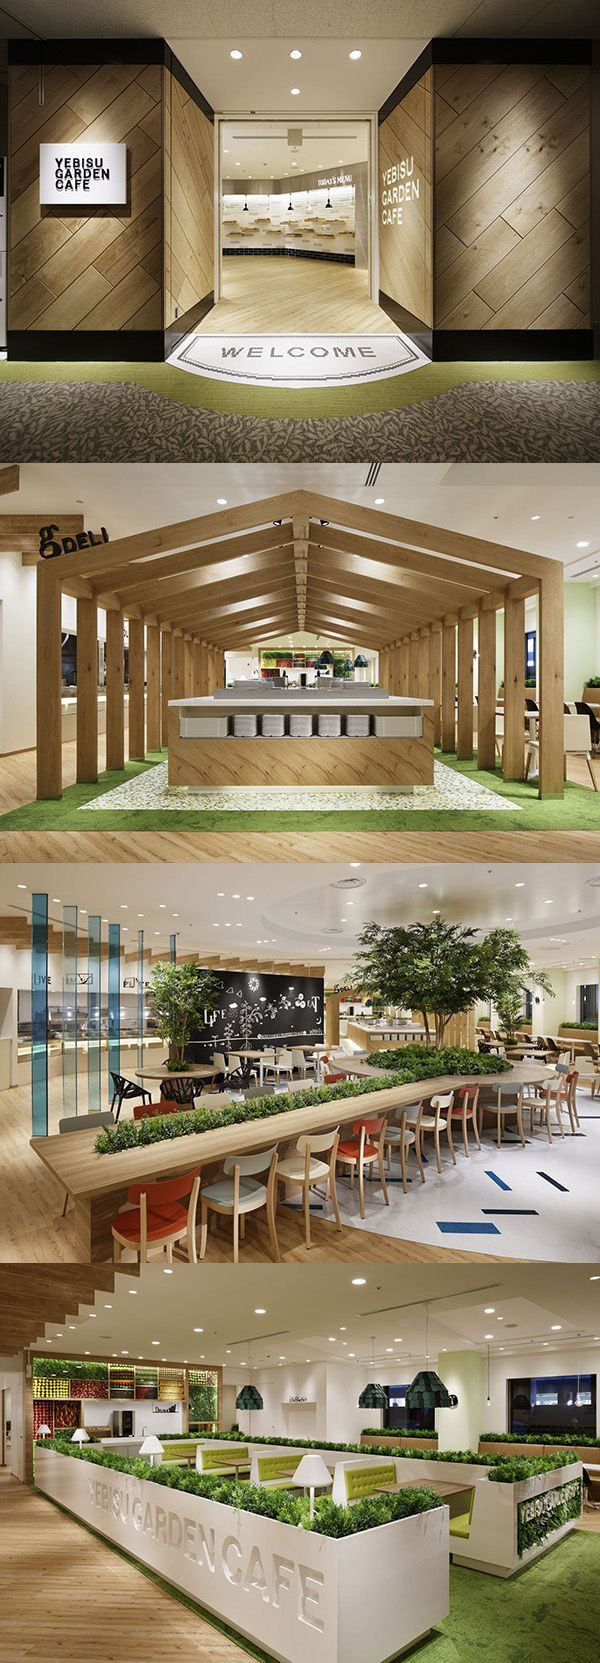 cafe and garden design - Google Search